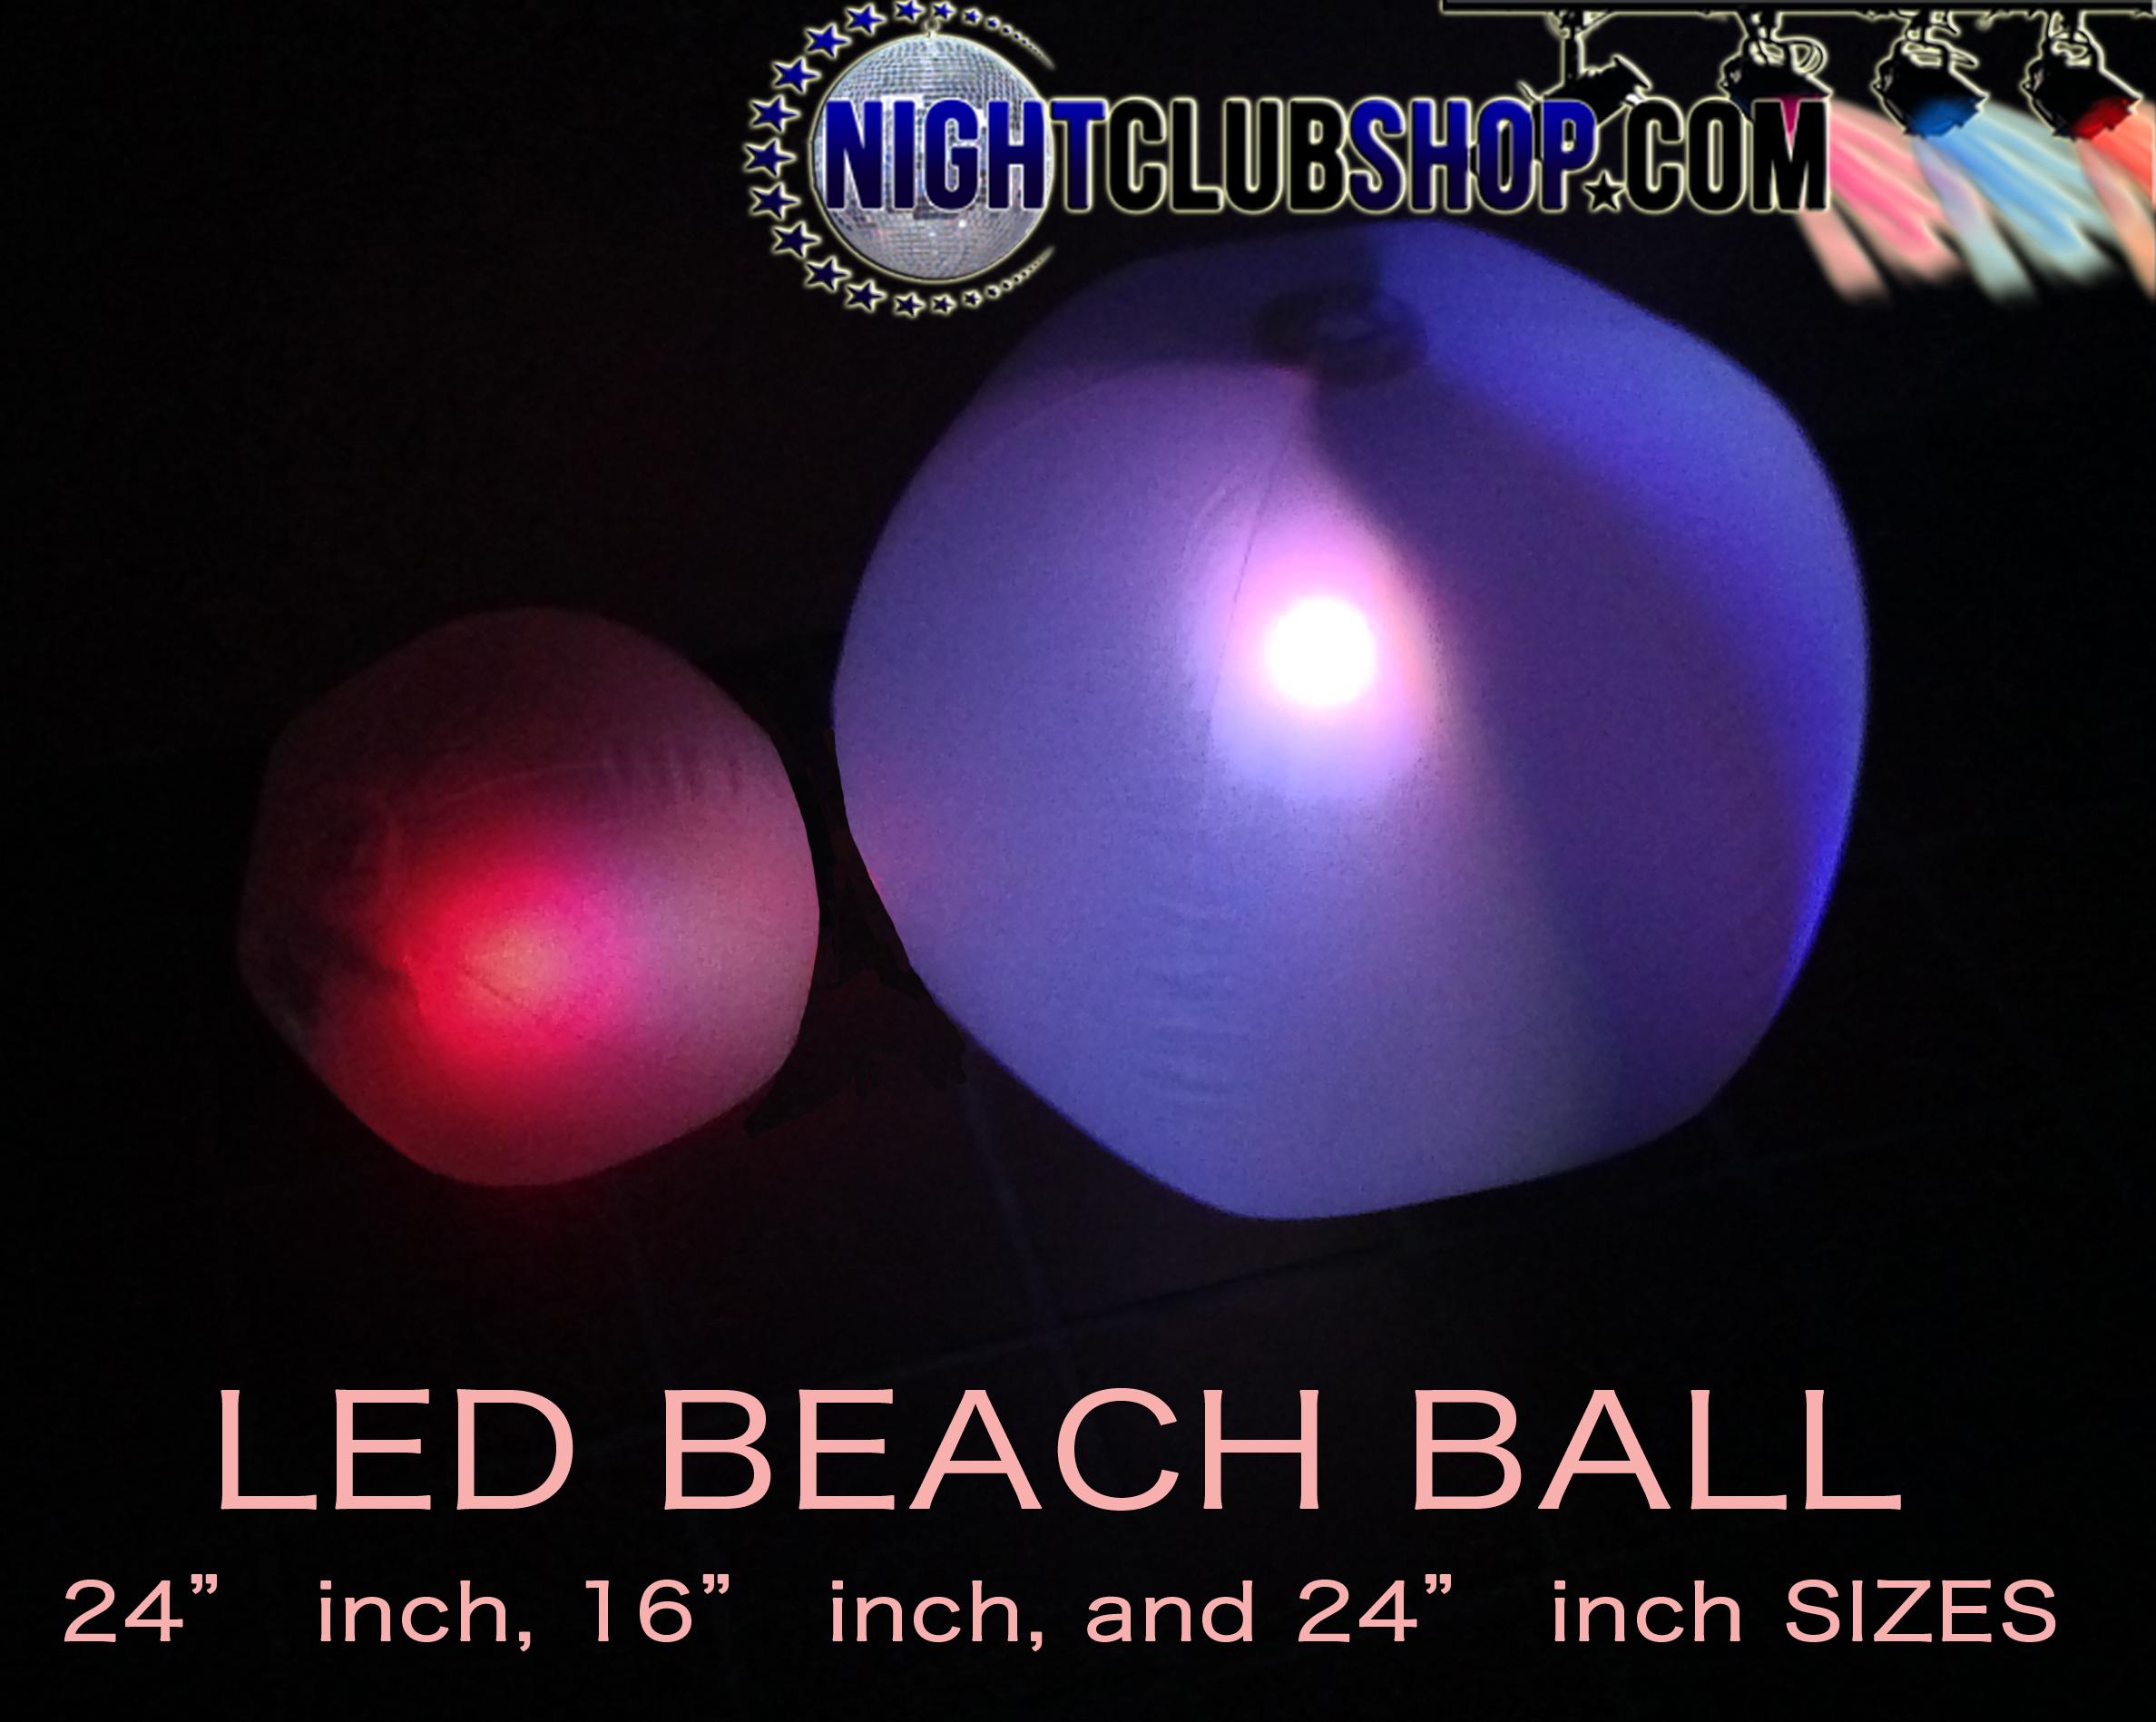 12inch-16inch-and24inch-ledbeachball.jpg